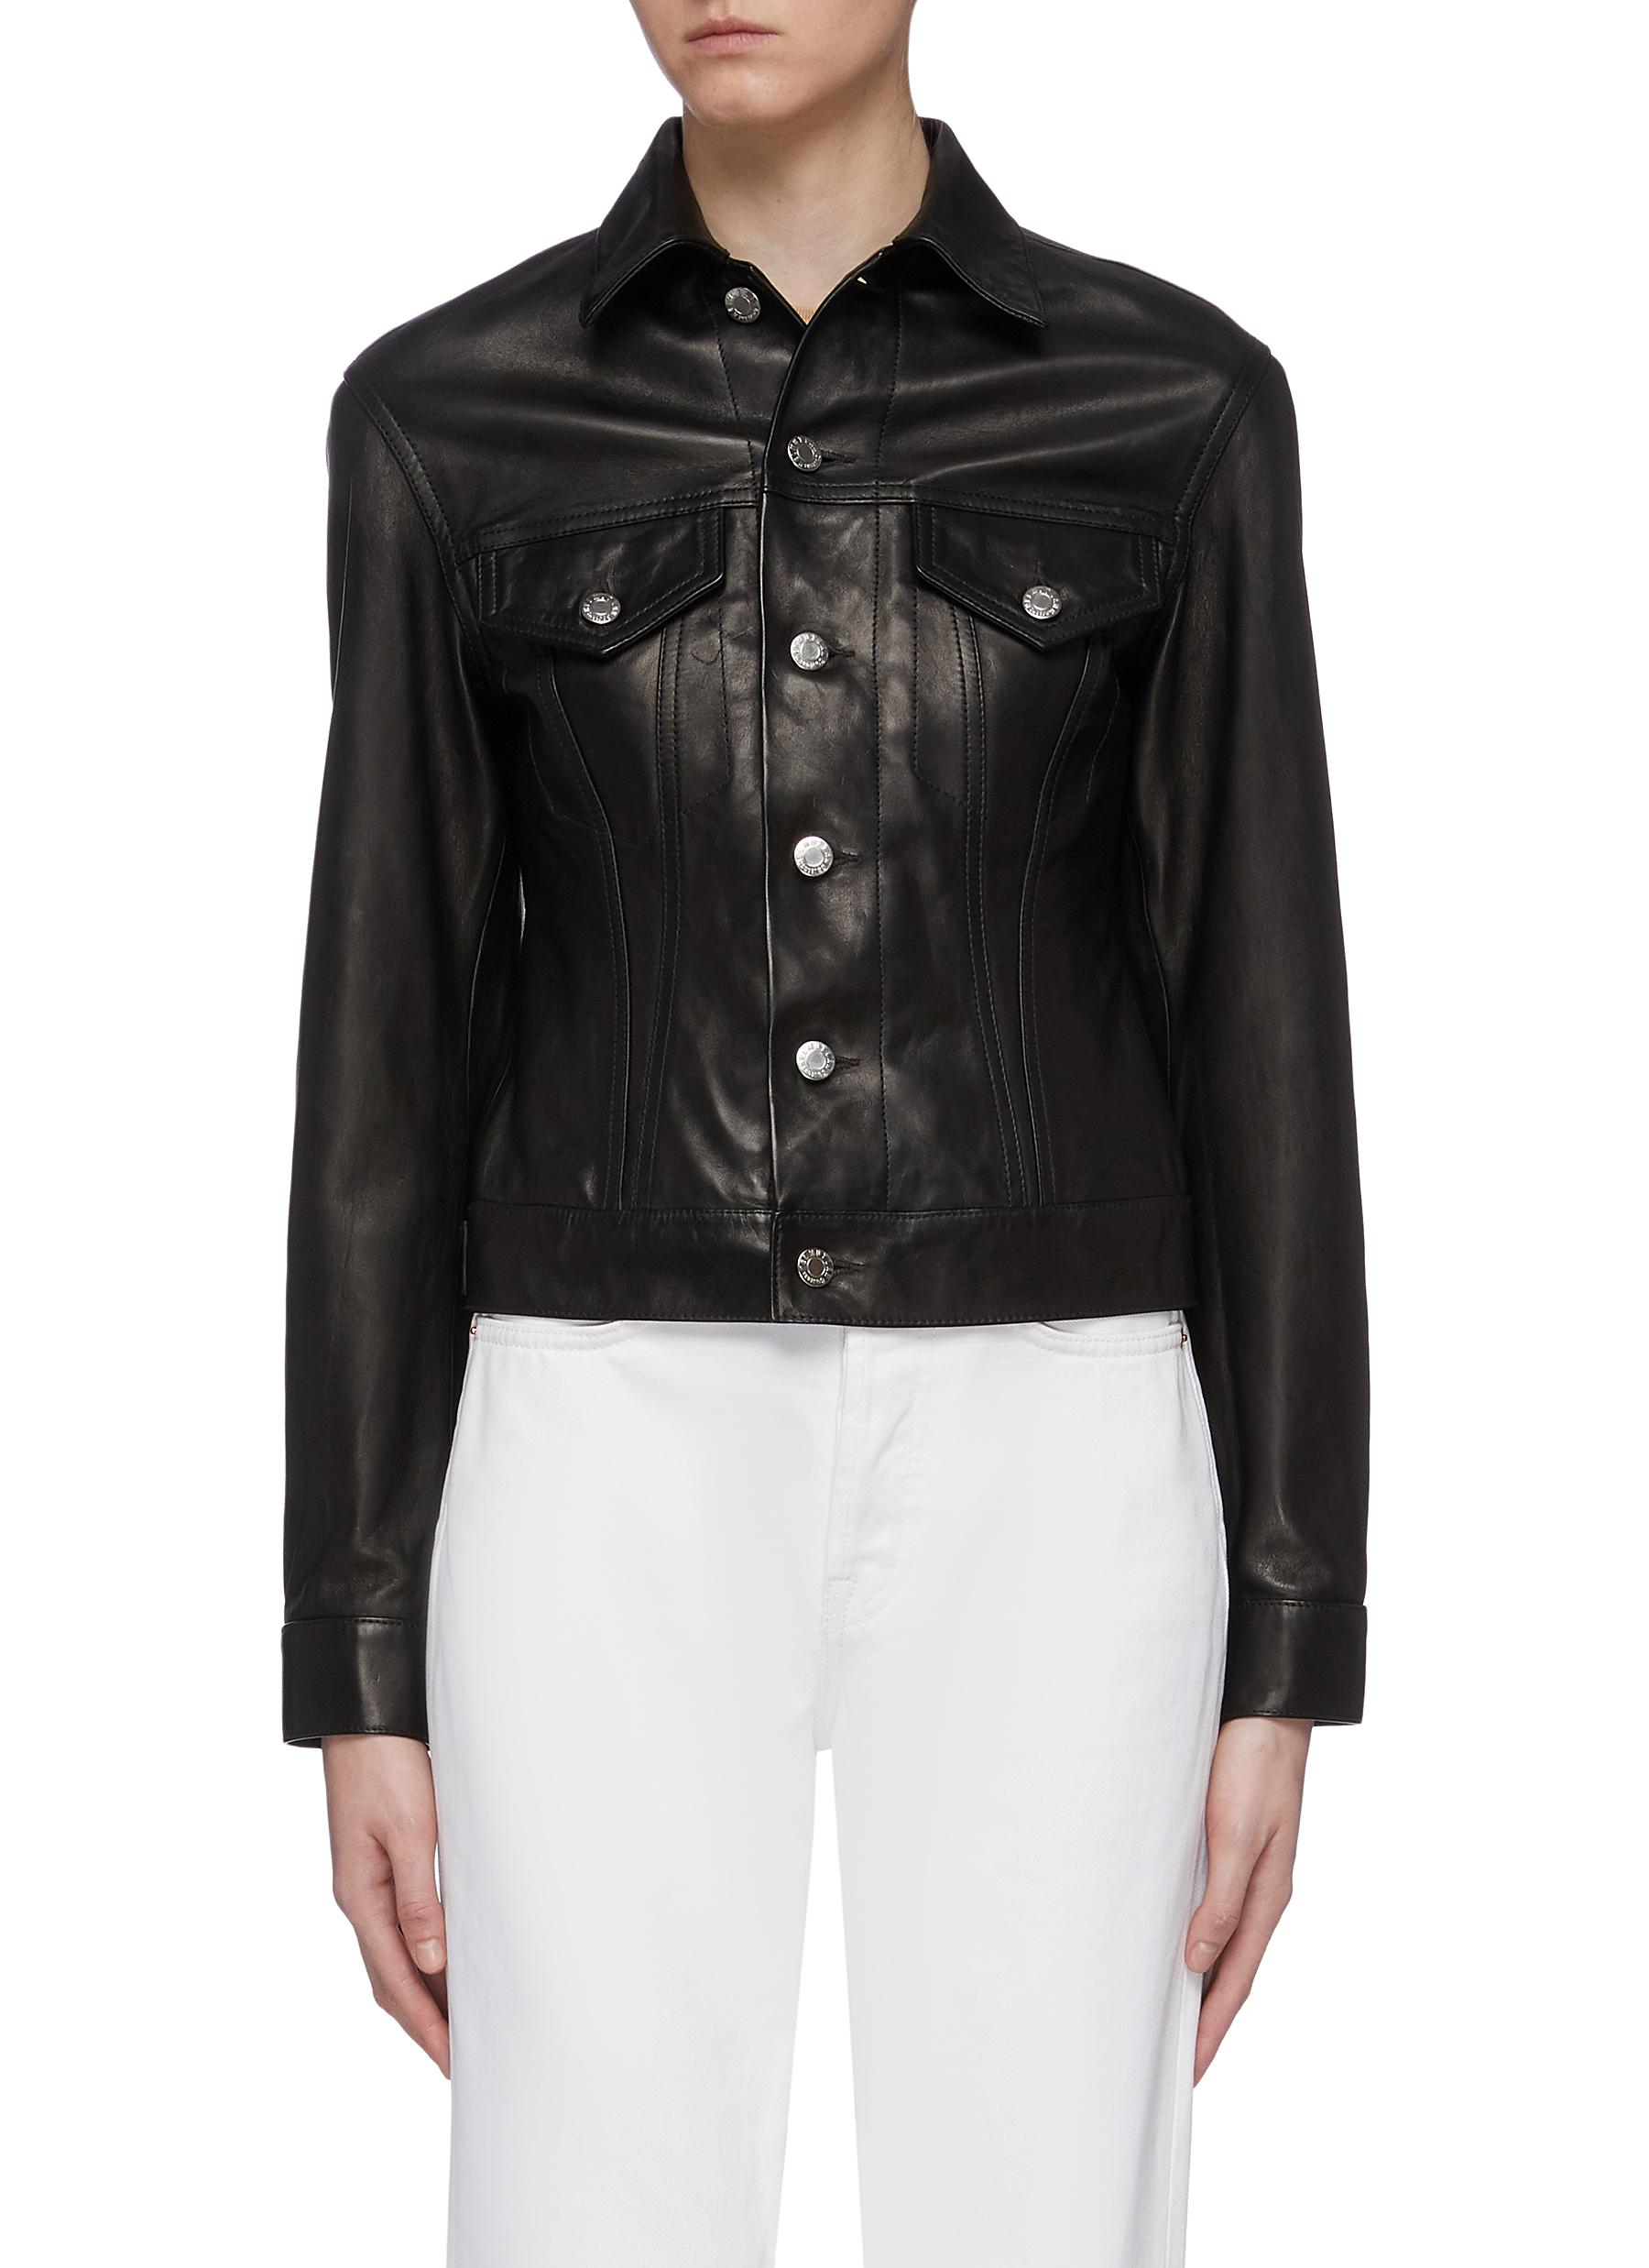 Femme leather trucker jacket by Helmut Lang